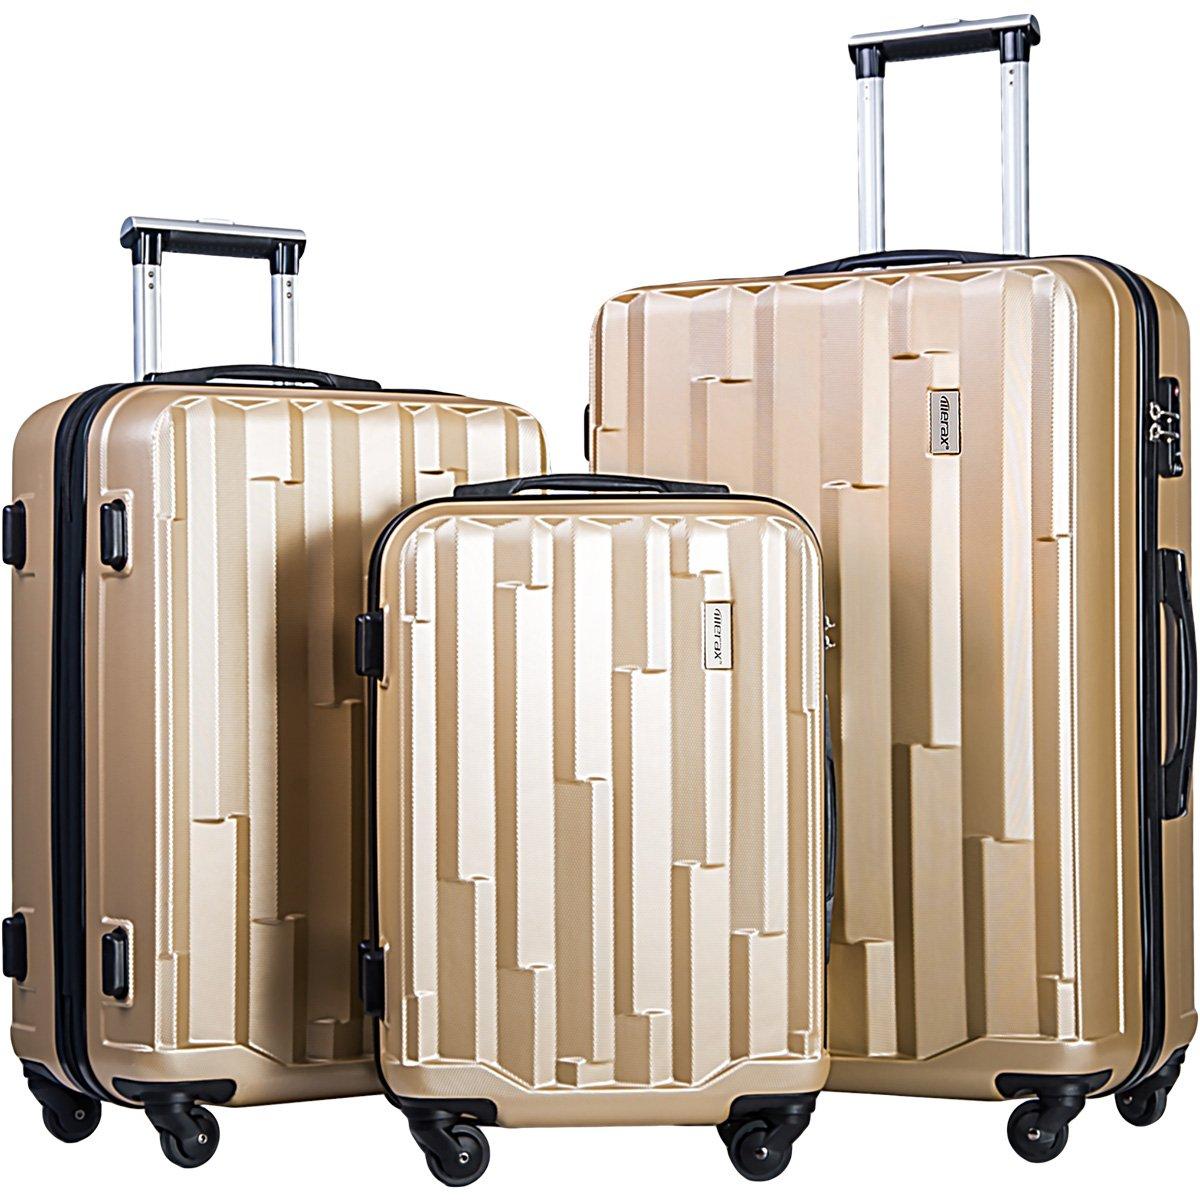 Merax Luggage set 3 piece luggages Suitcase with TSA lock (Champagne)